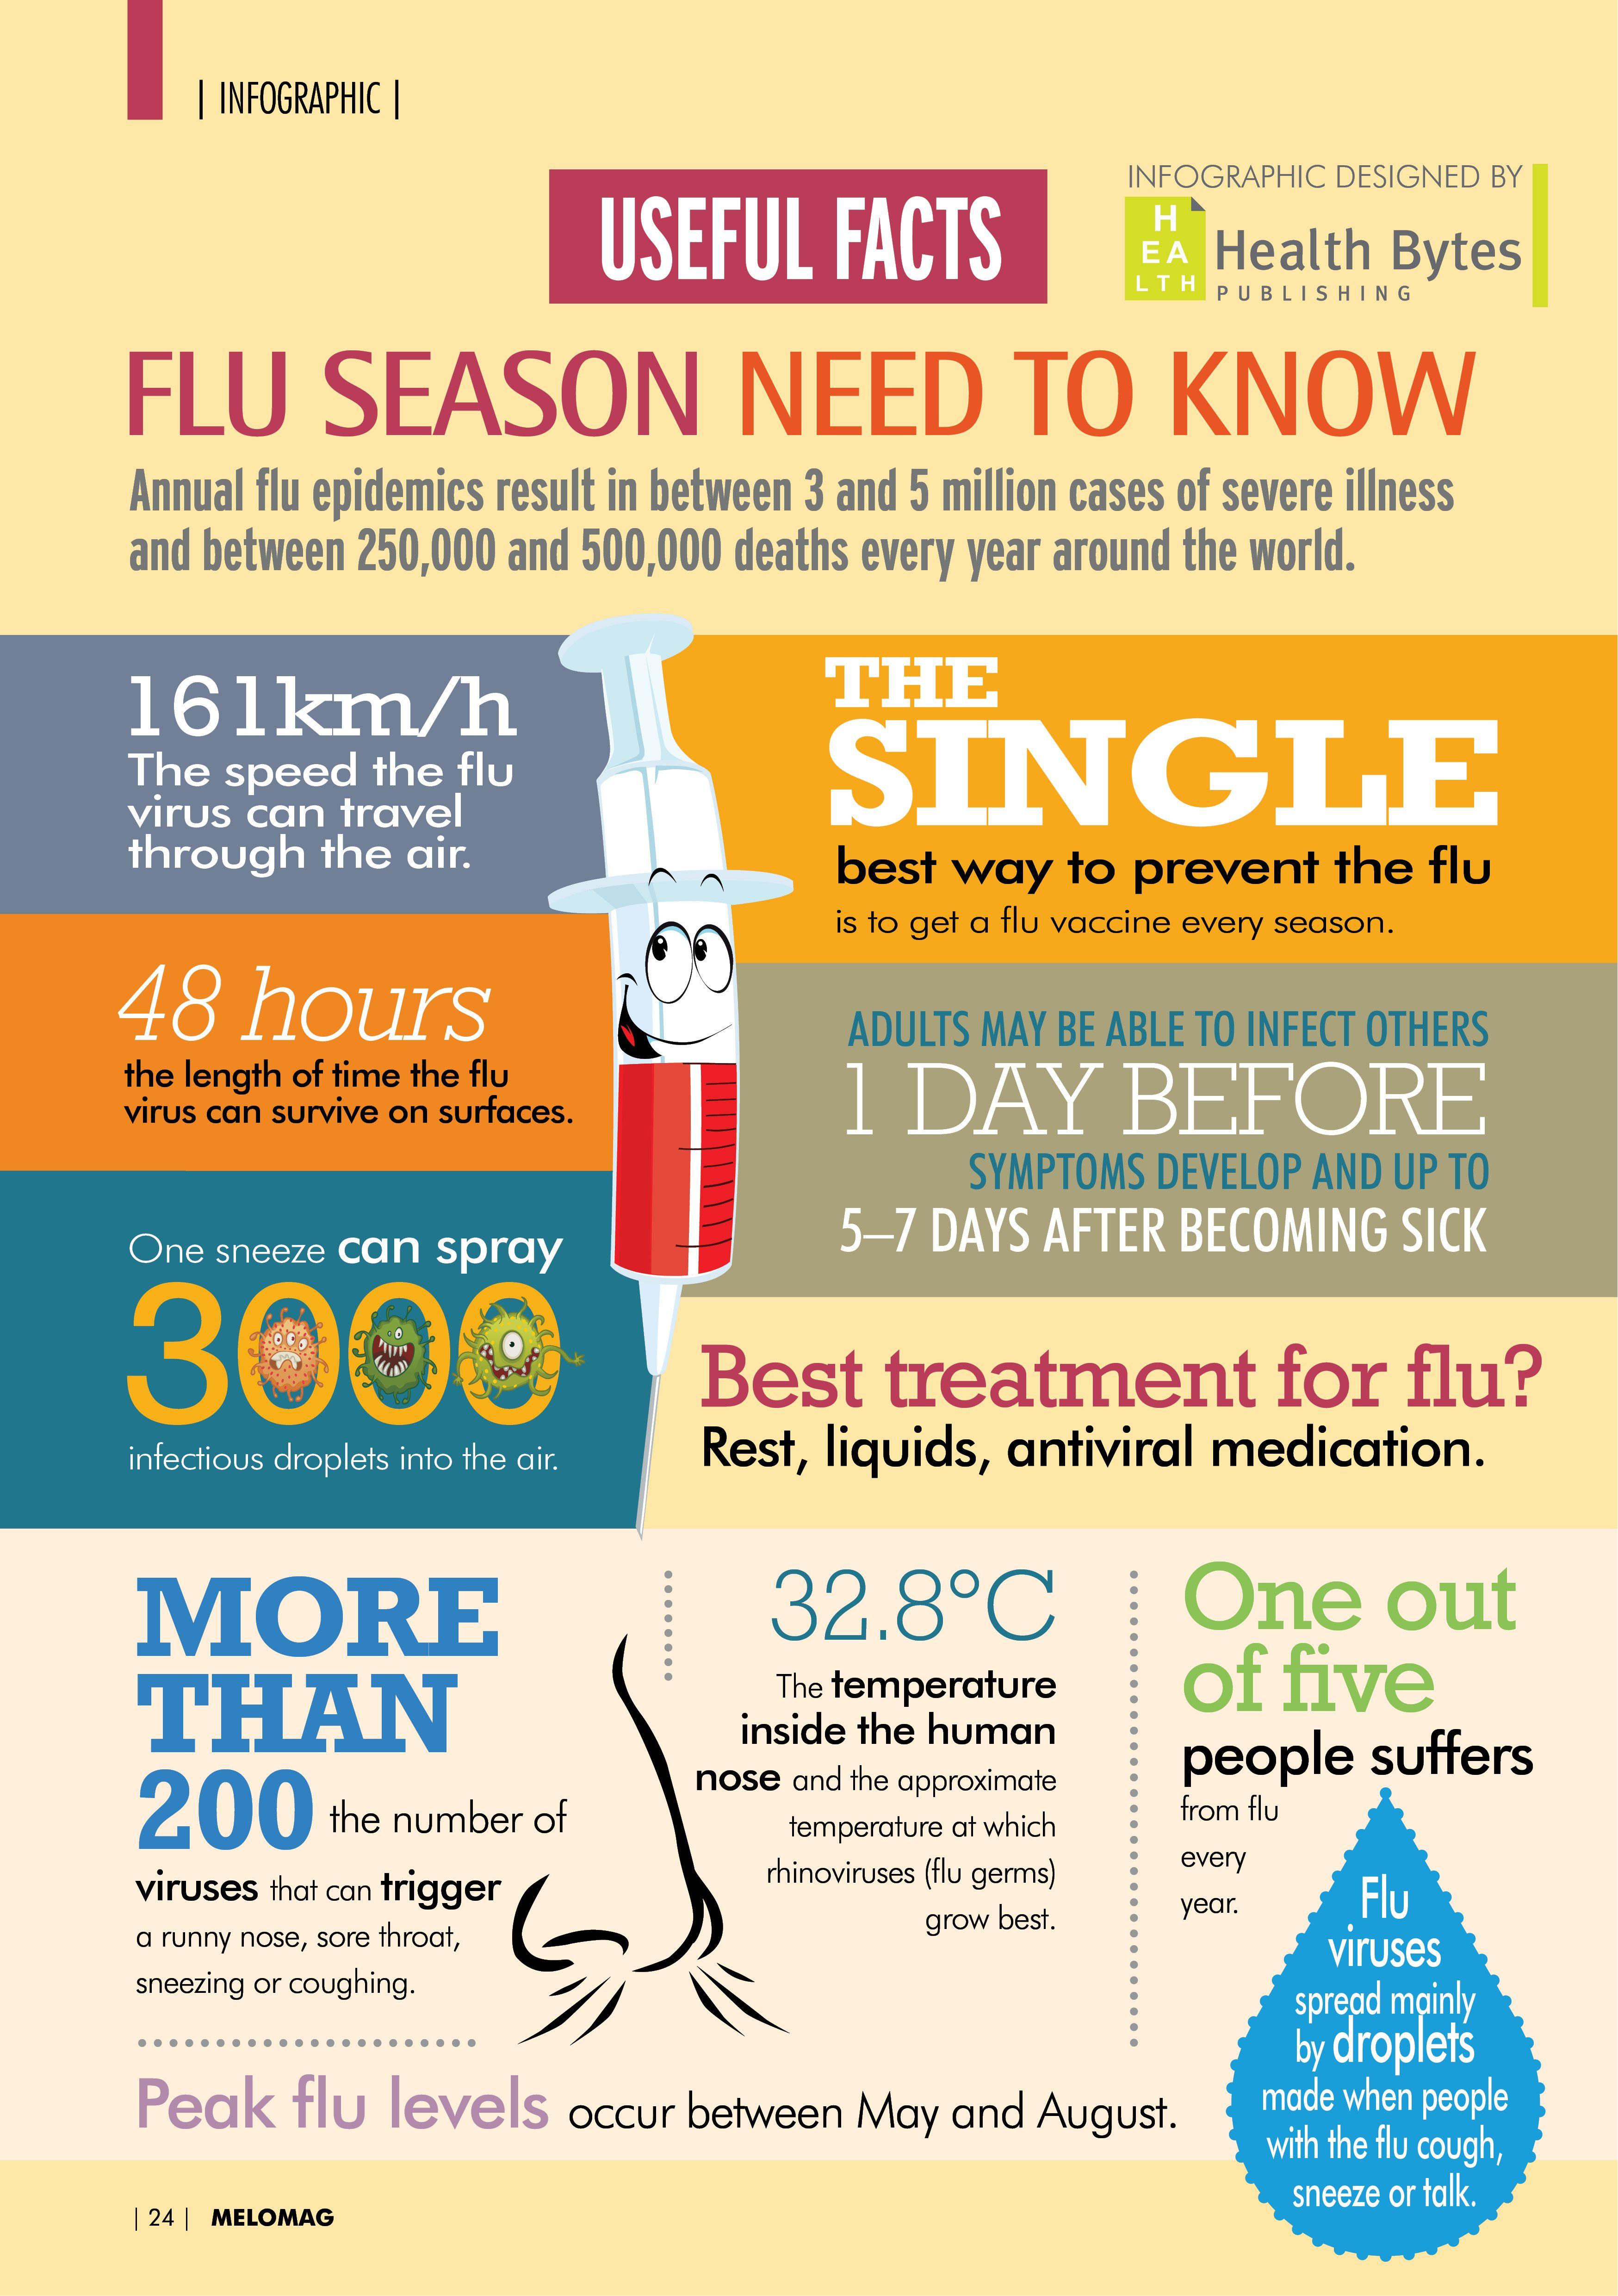 d7d97eccf297976906164ca9f4e8d430 - How To Convince Someone To Get The Flu Shot